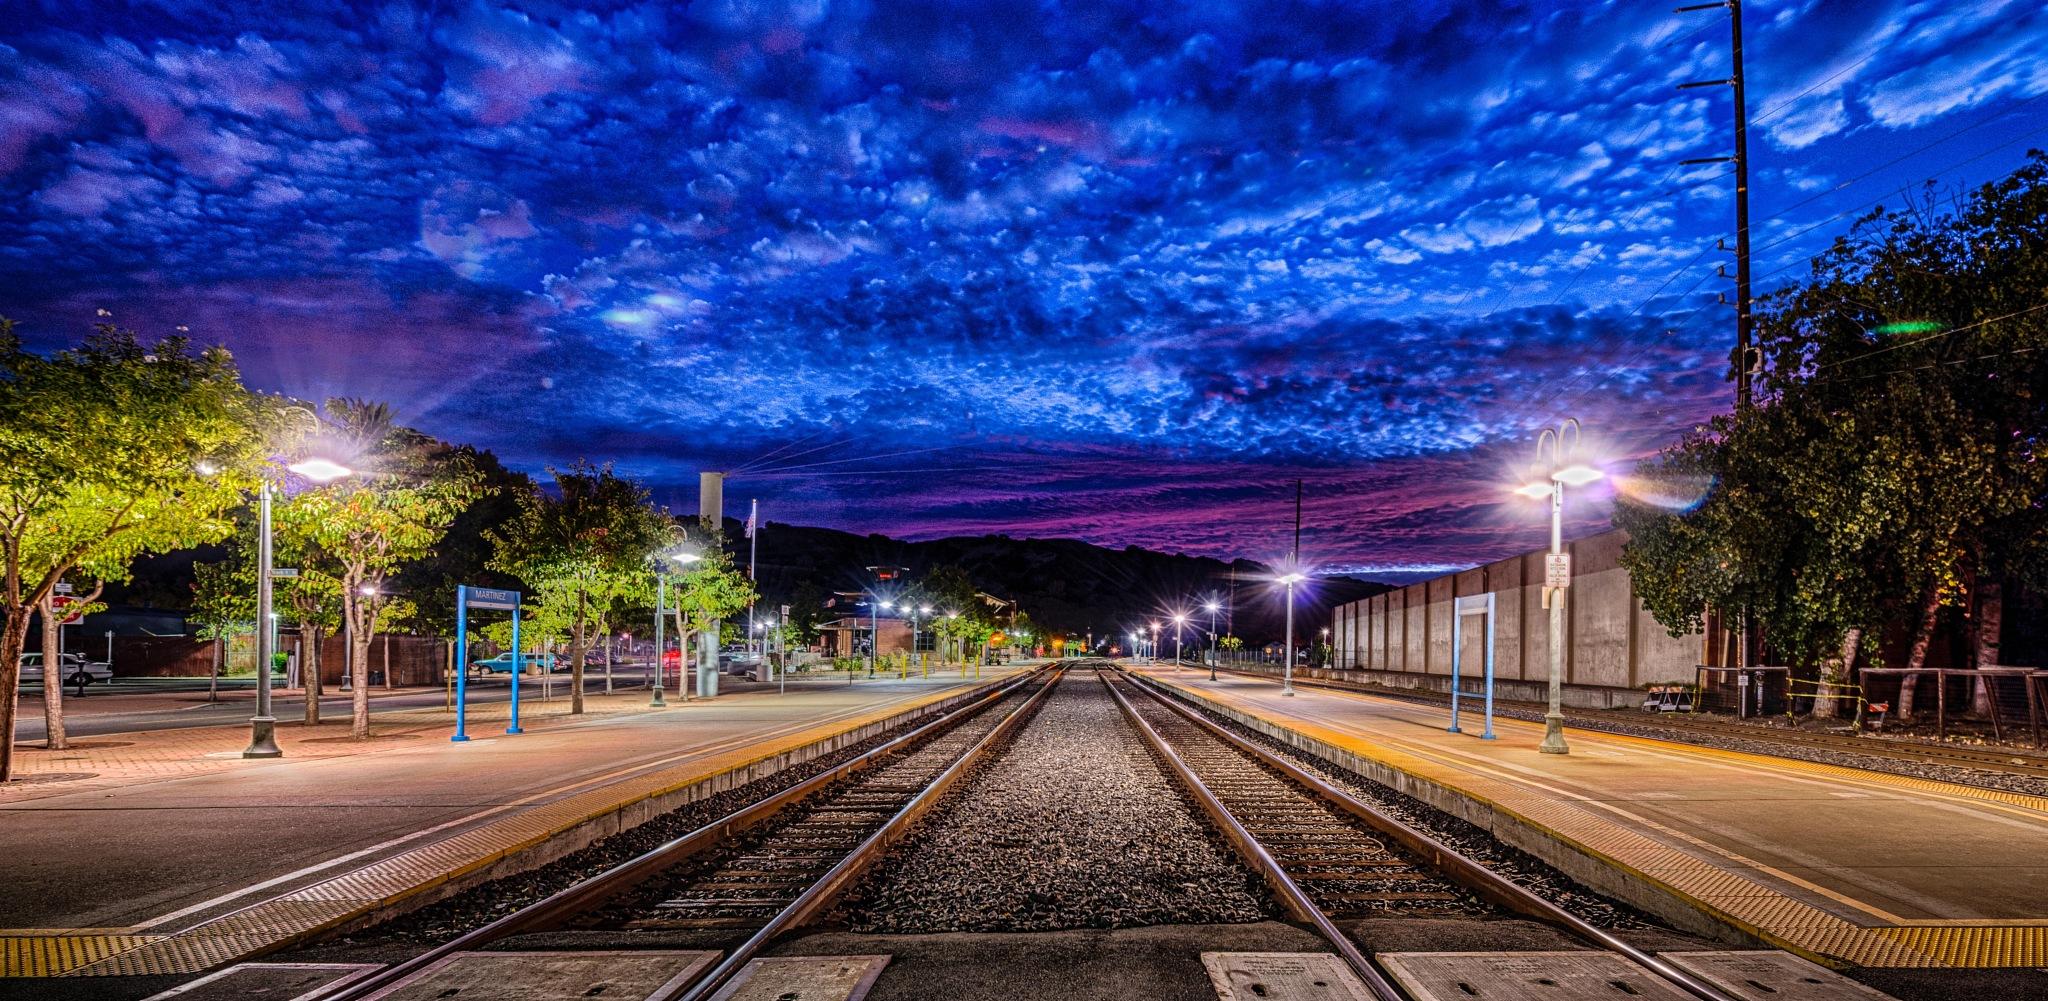 The Tracks by Craig Turner